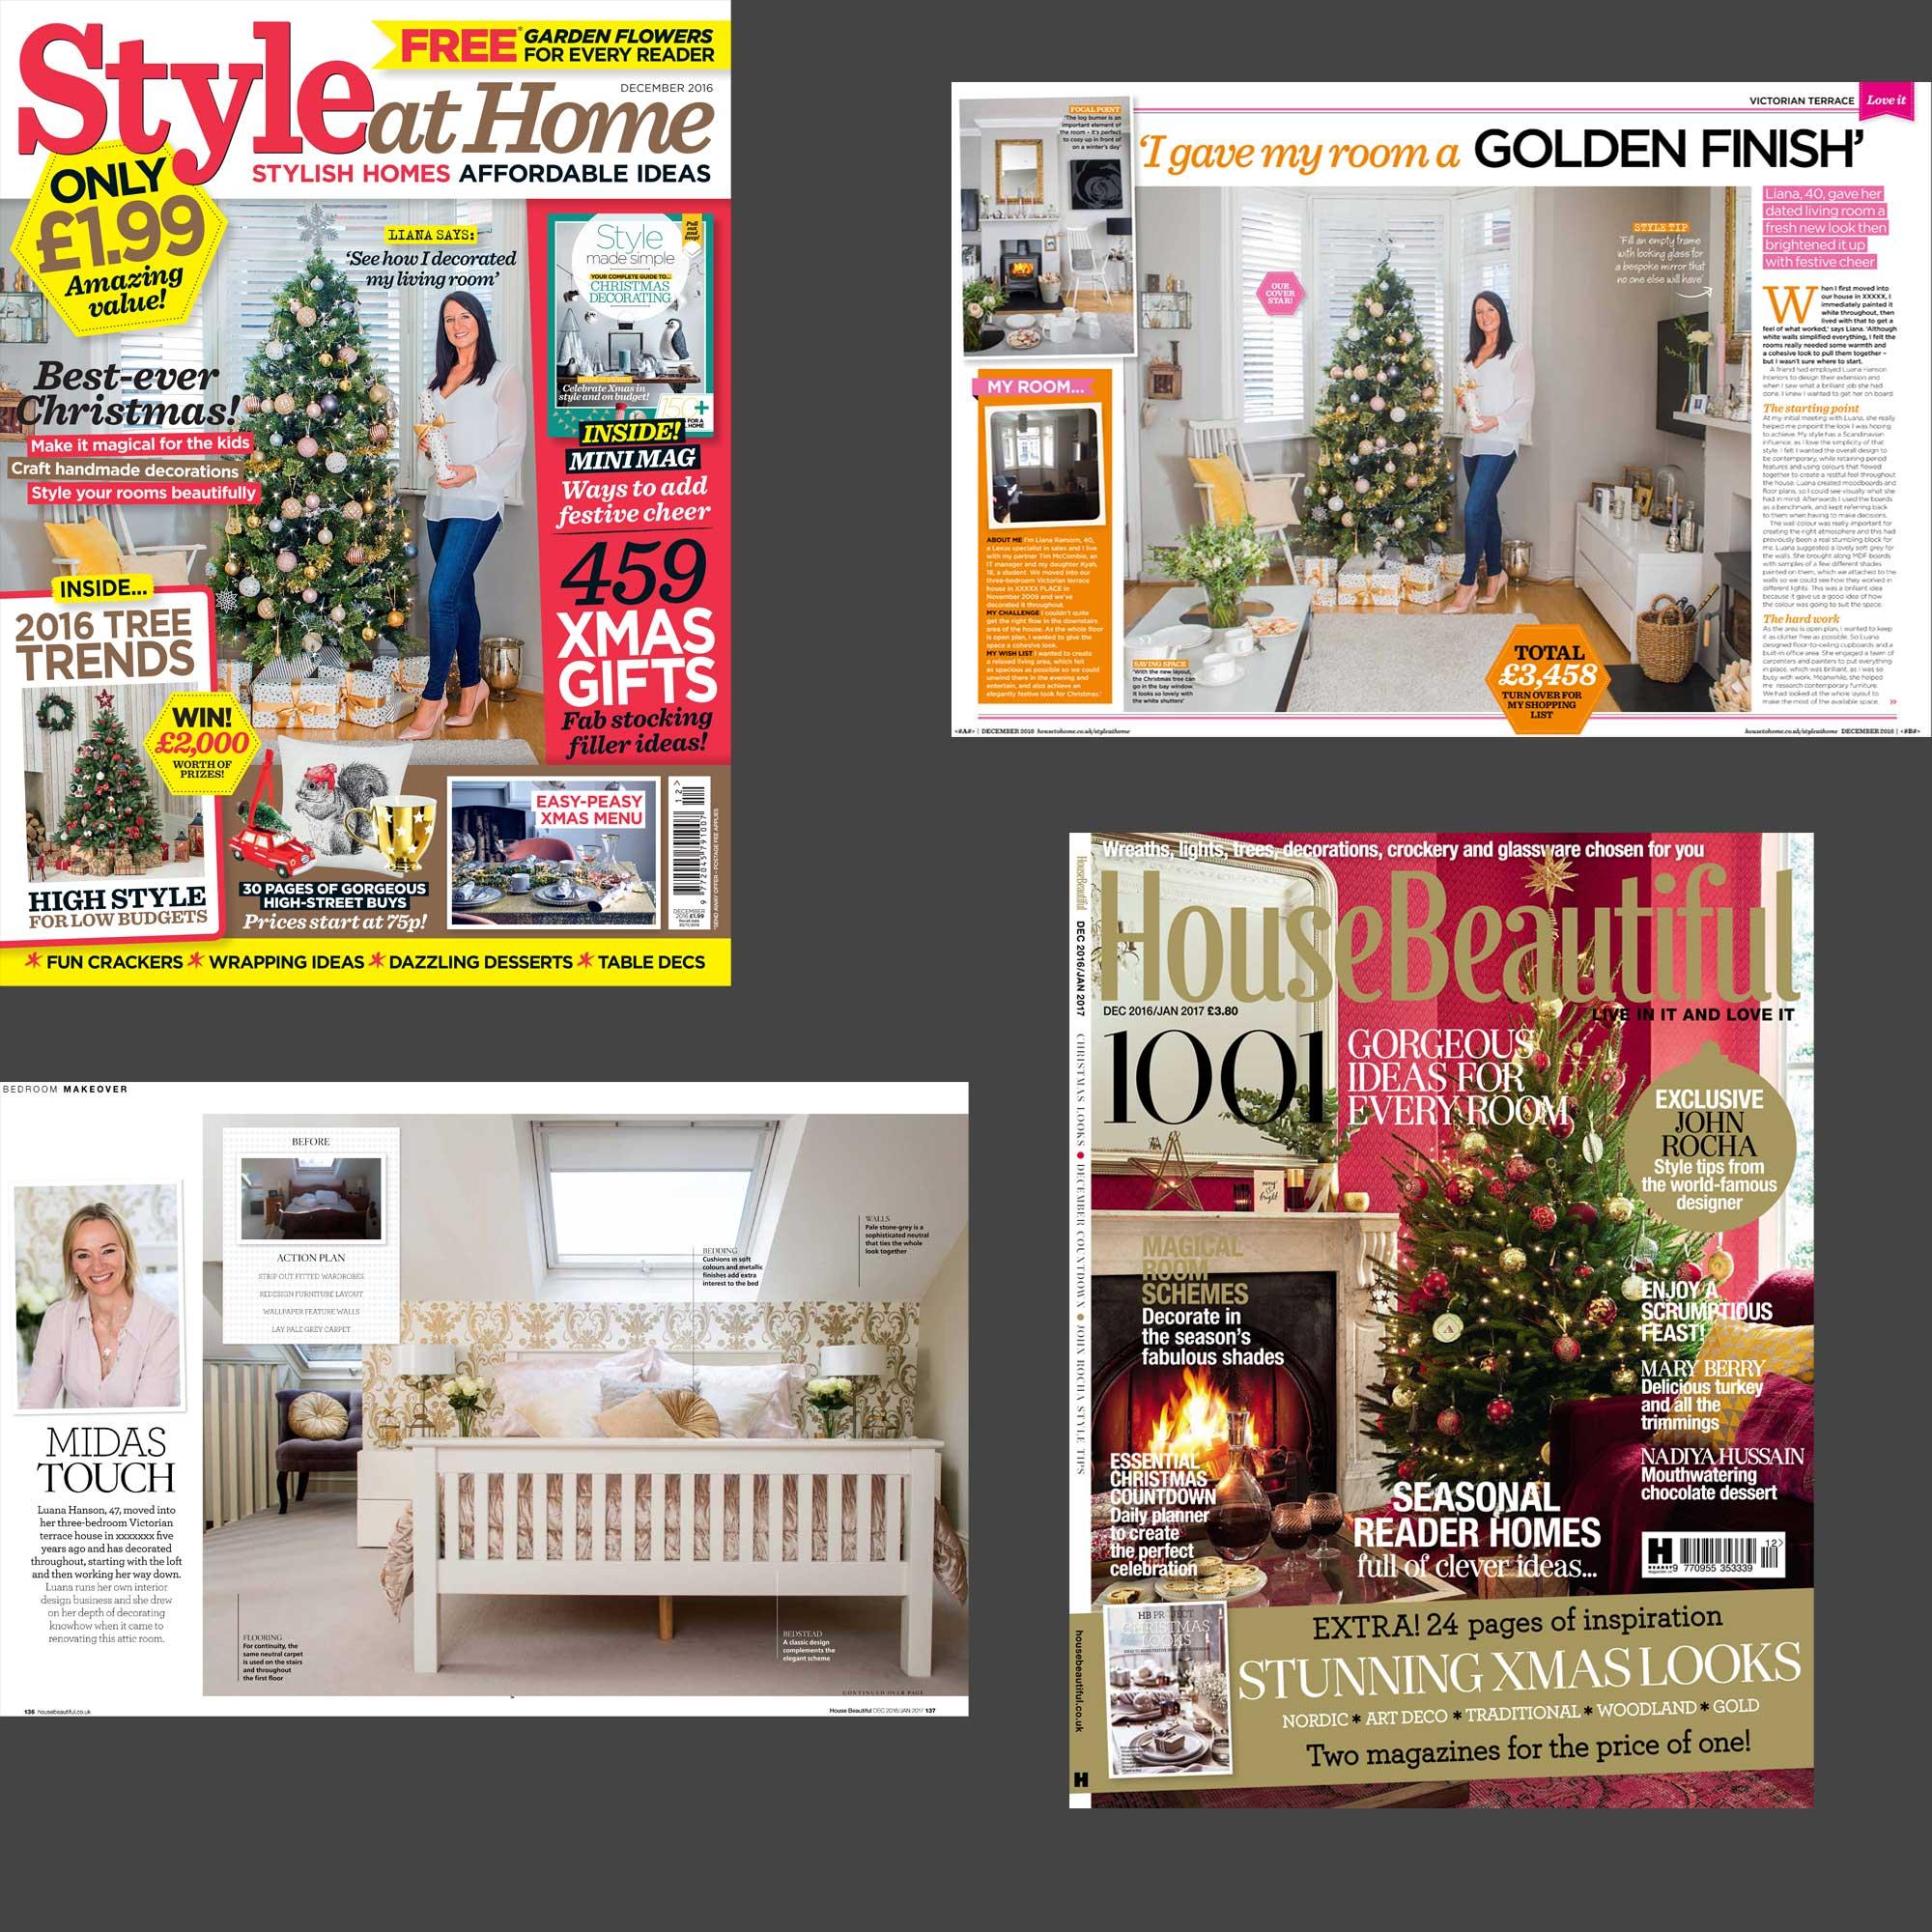 Luana_Hanson_Interiors_Magazine_coverage